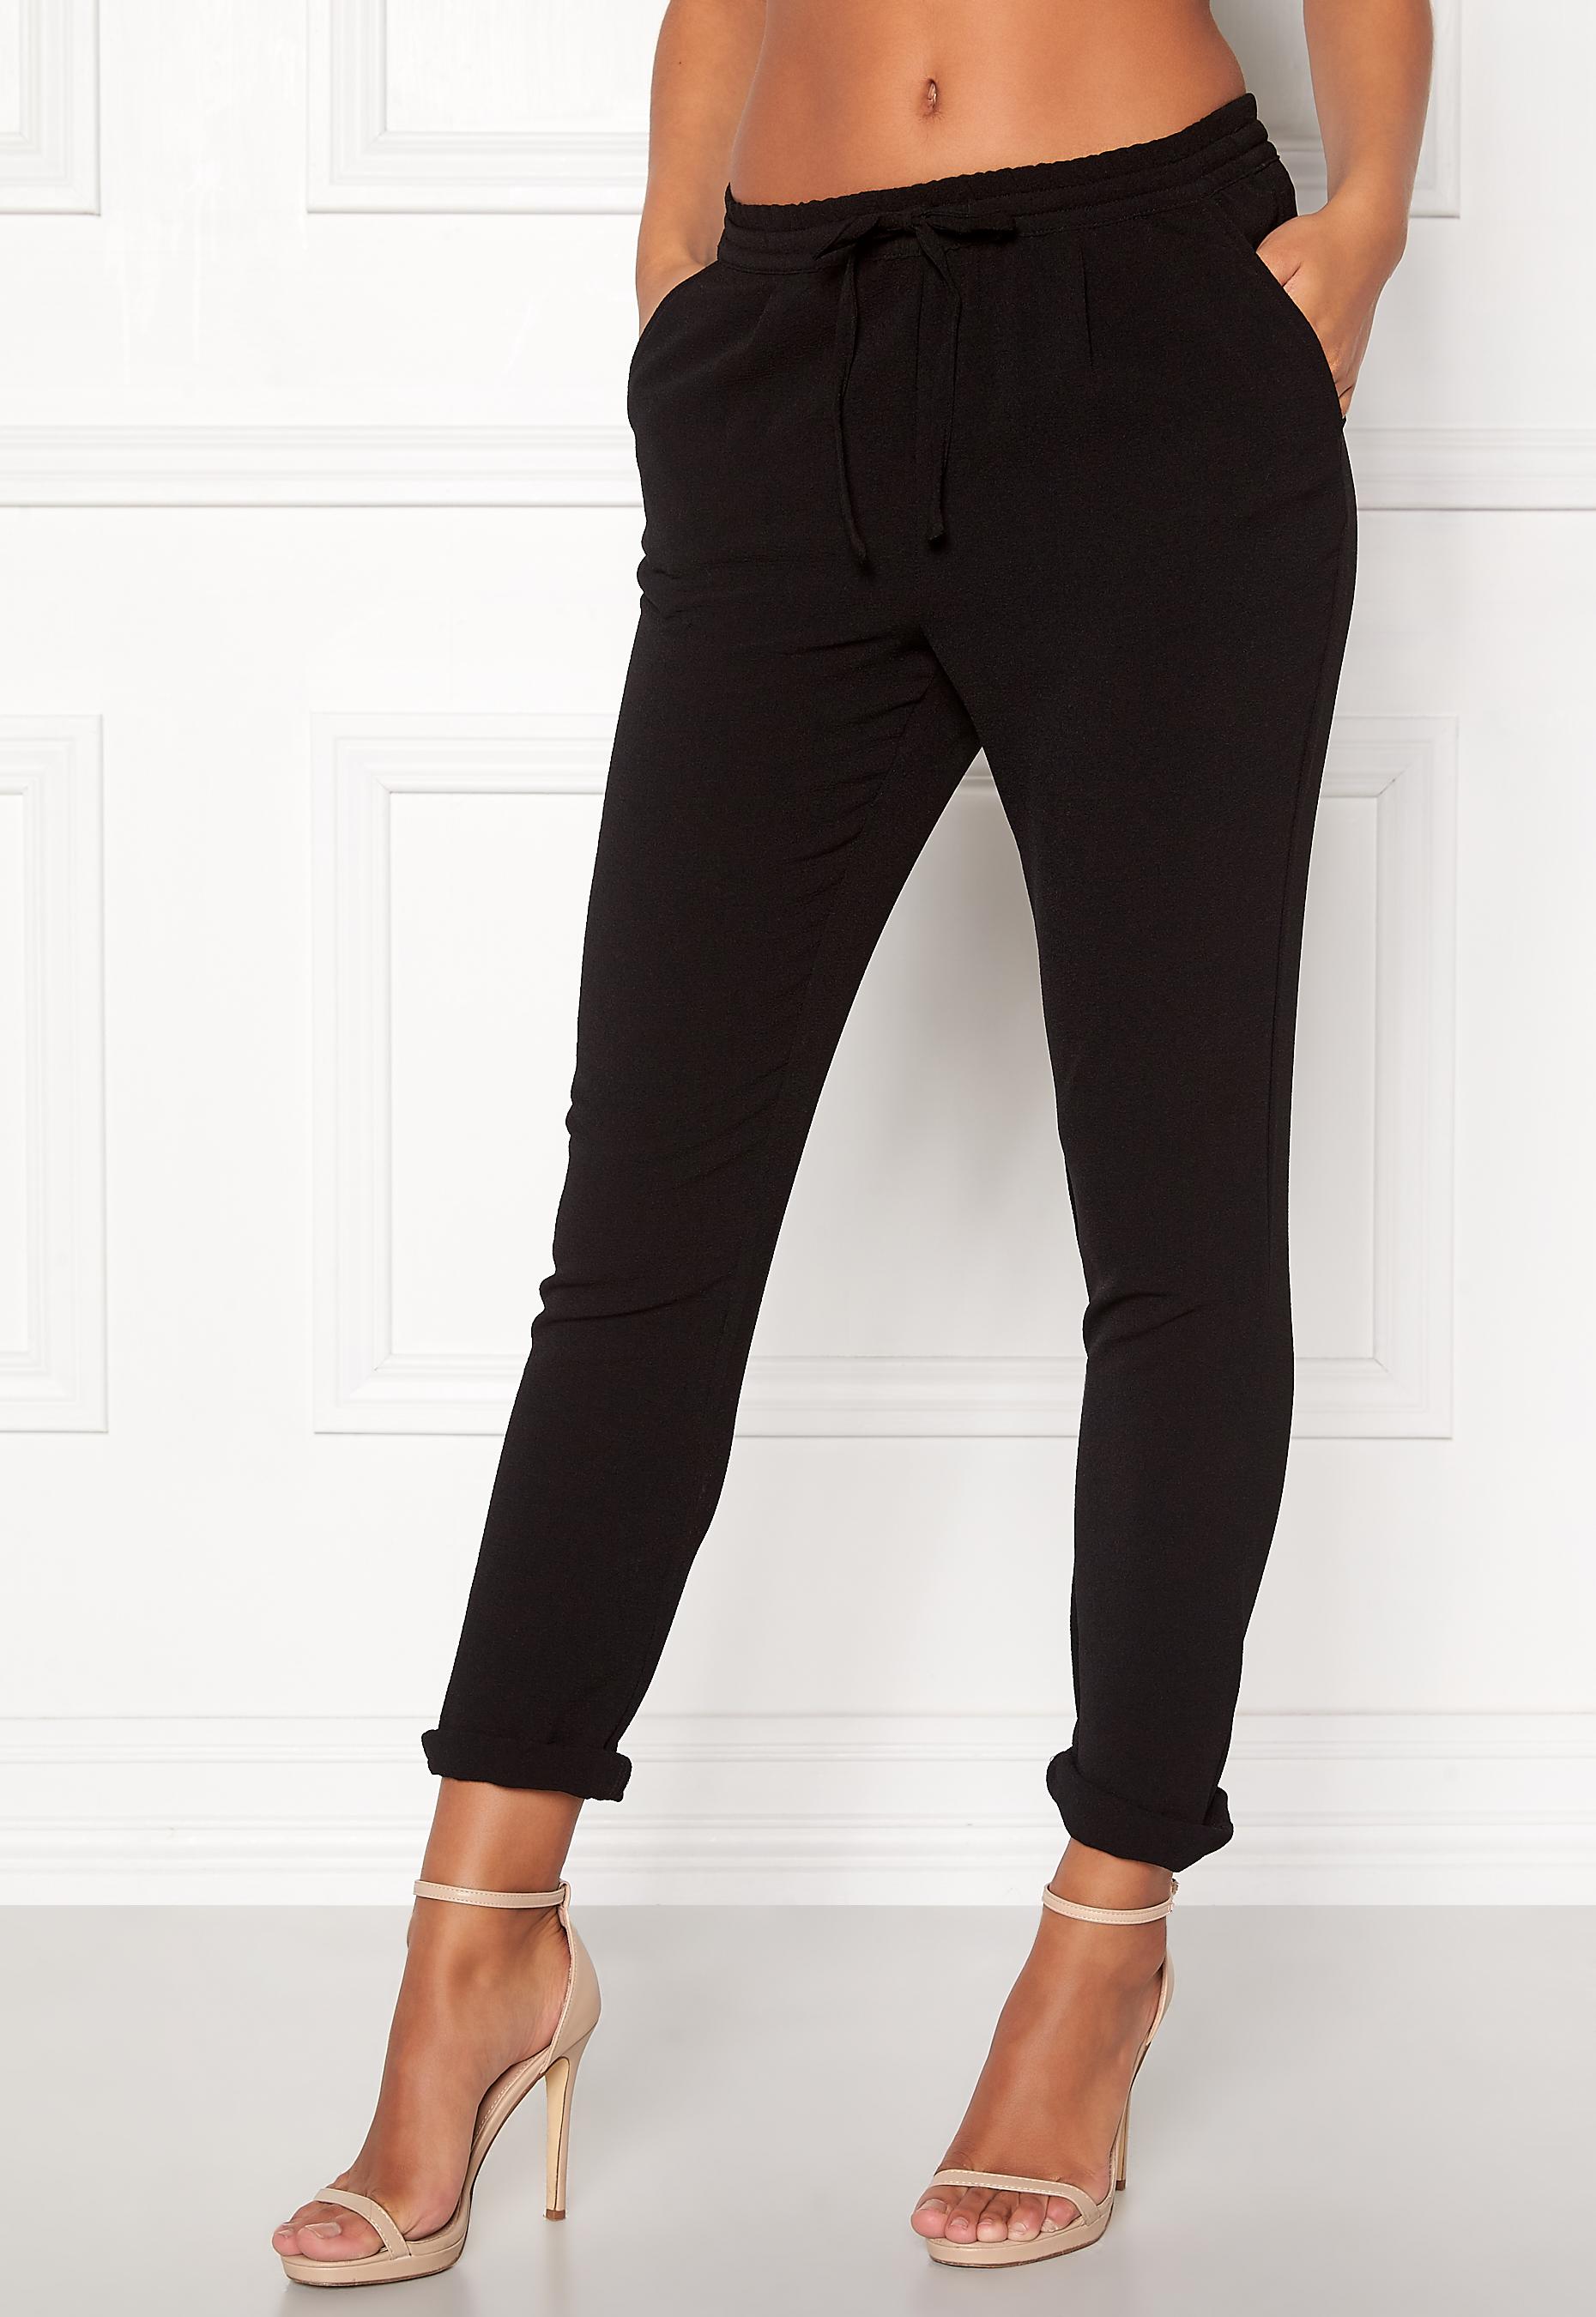 ONLY Turner Pants Black - Bubbleroom 8e15a5515013f